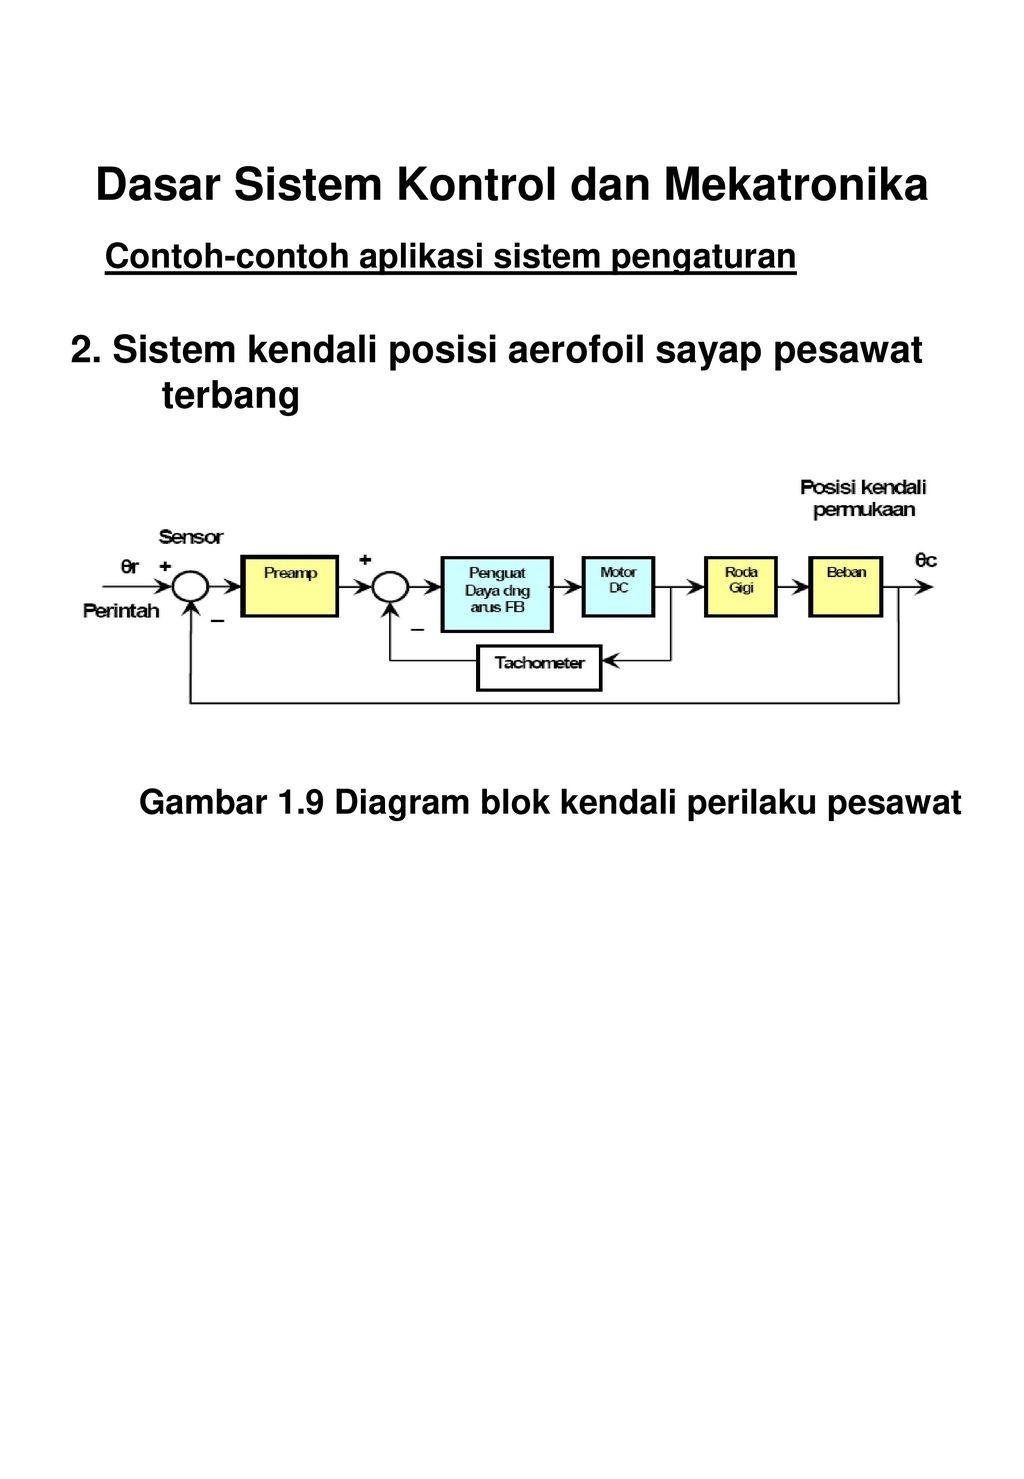 Diktat instrumentasi sistem kendali ppt download dasar sistem kontrol dan mekatronika ccuart Choice Image